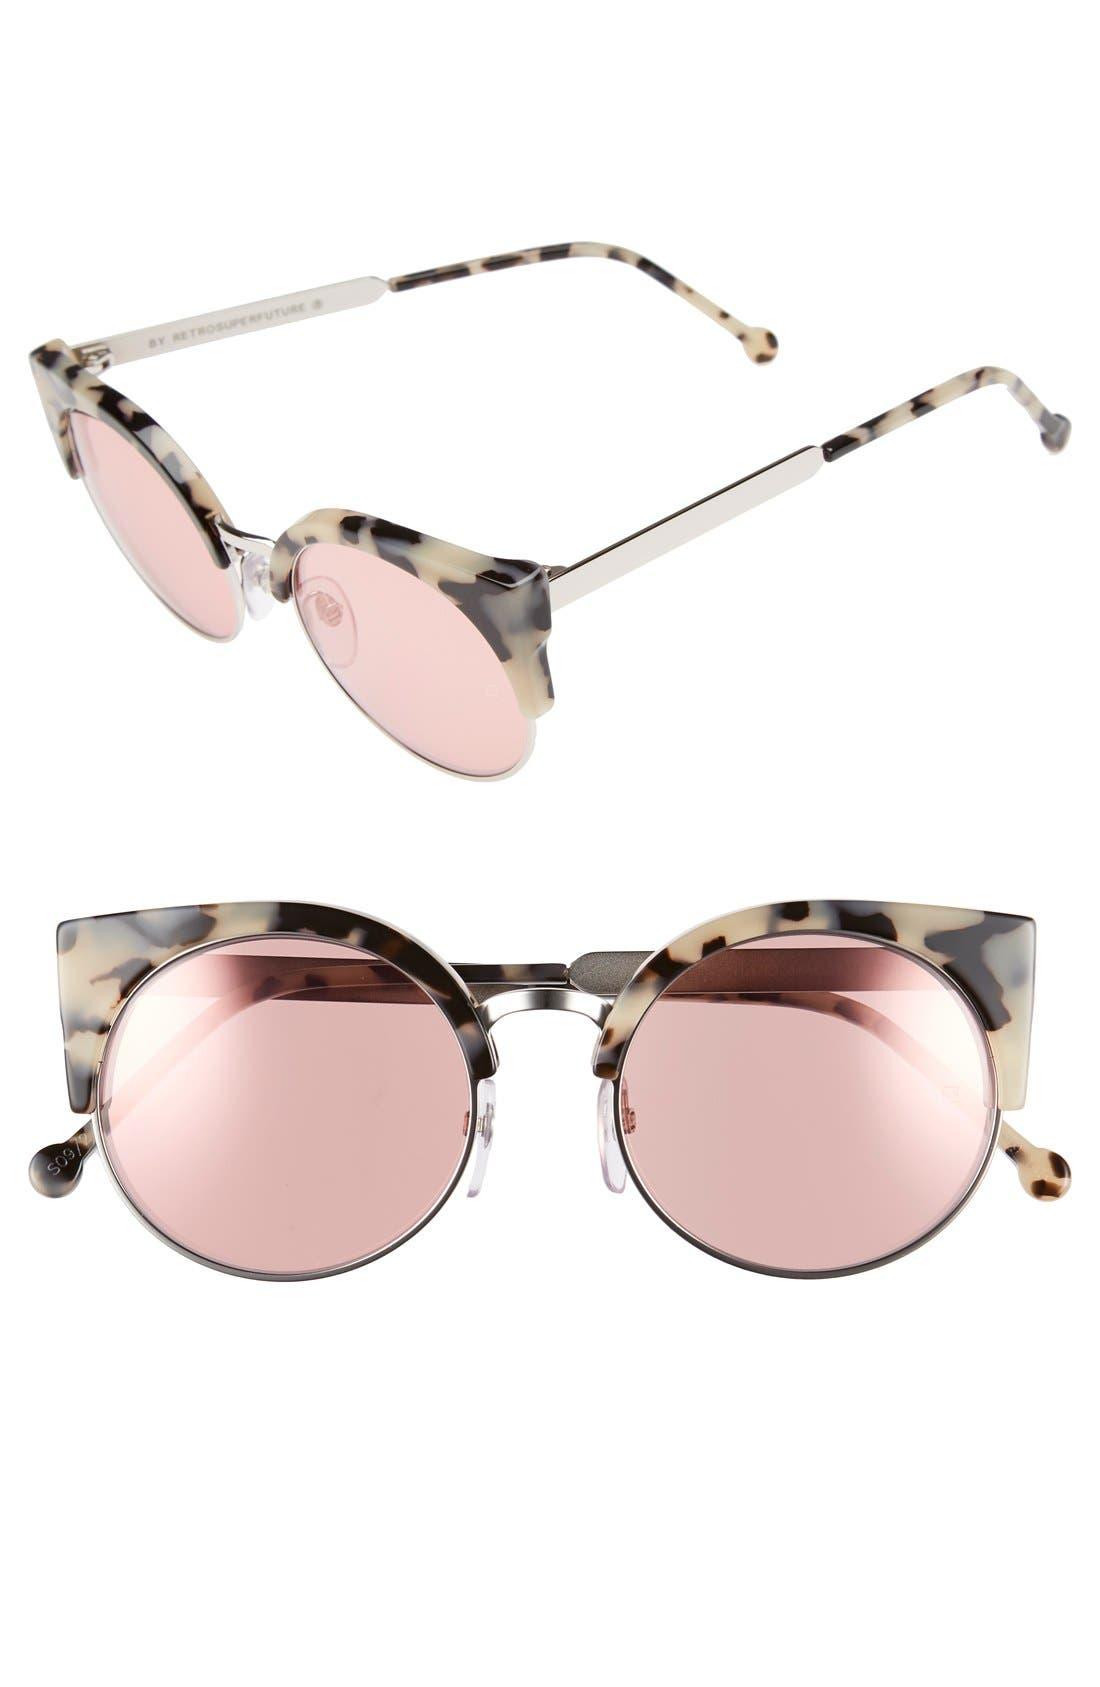 Main Image - SUPER by RETROSUPERFUTURE® 'Ilaria Gel' 55mm Cat Eye Sunglasses